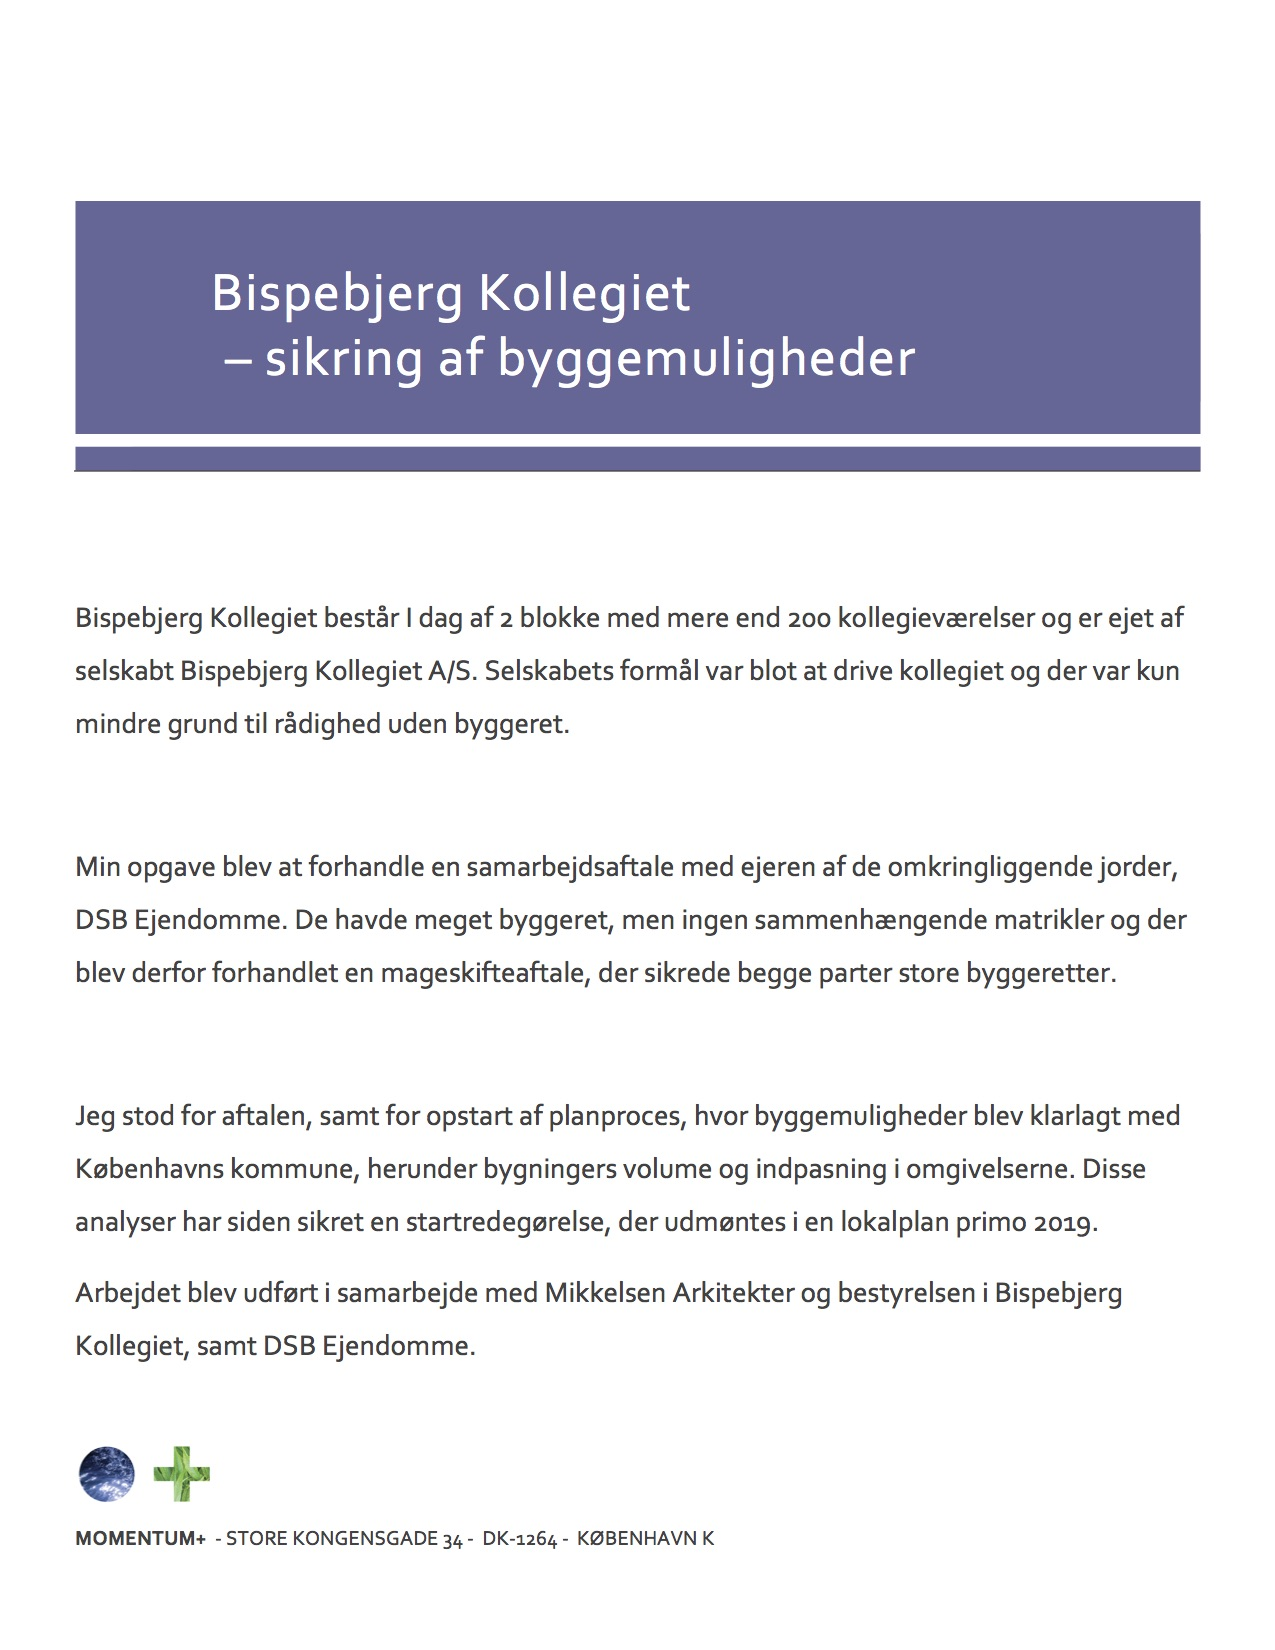 Bispebjerg Kollegiet - 2 ref. -2.jpg